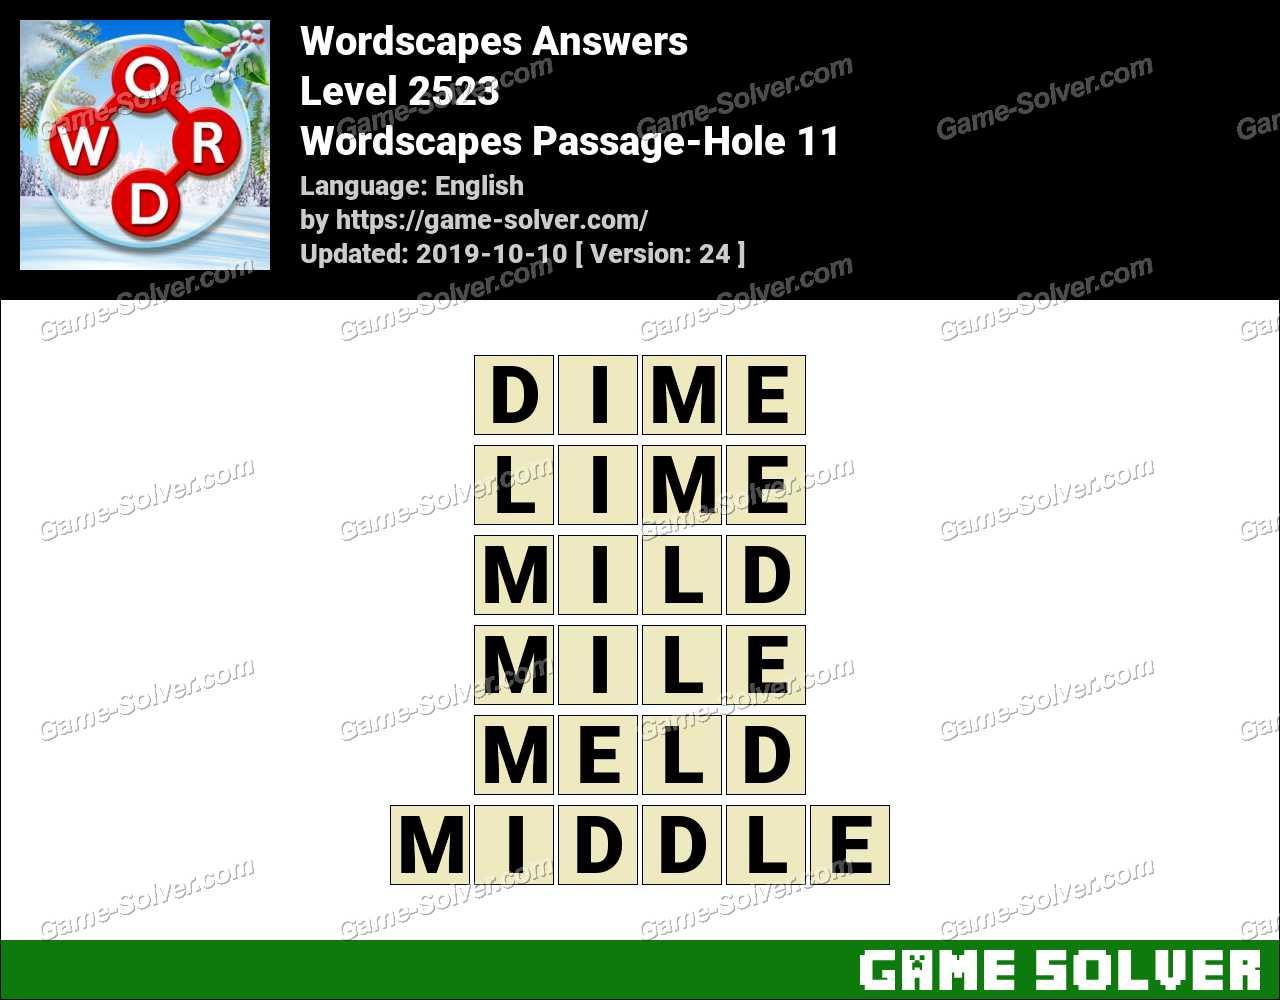 Wordscapes Passage-Hole 11 Answers